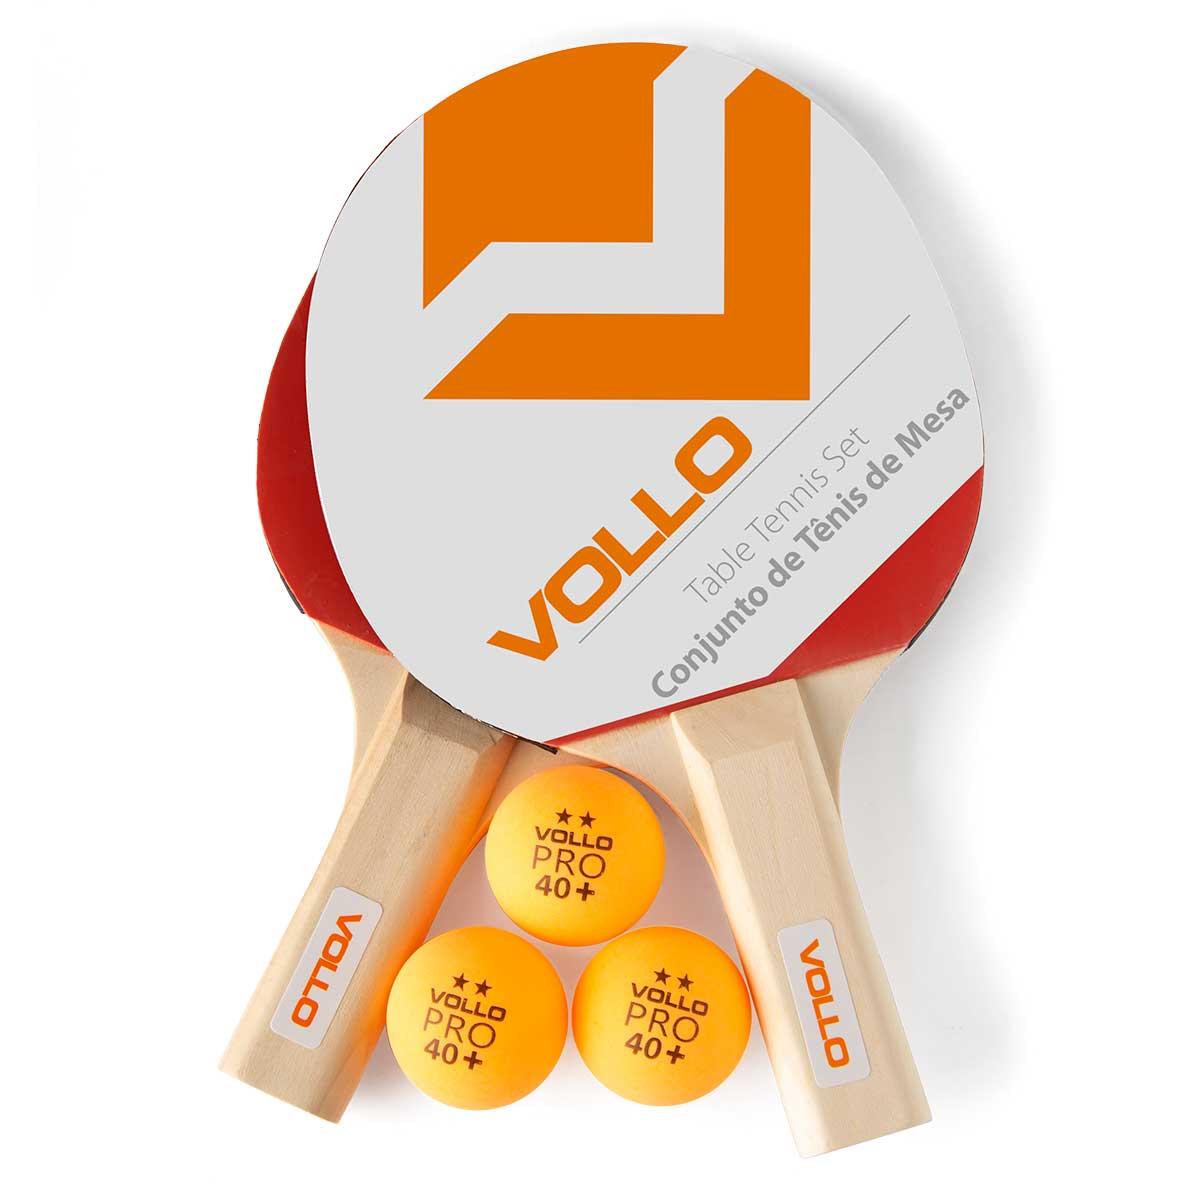 Raquete Tenis de Mesa Ping Pong com 3 Bolas - Iniciante - Vollo